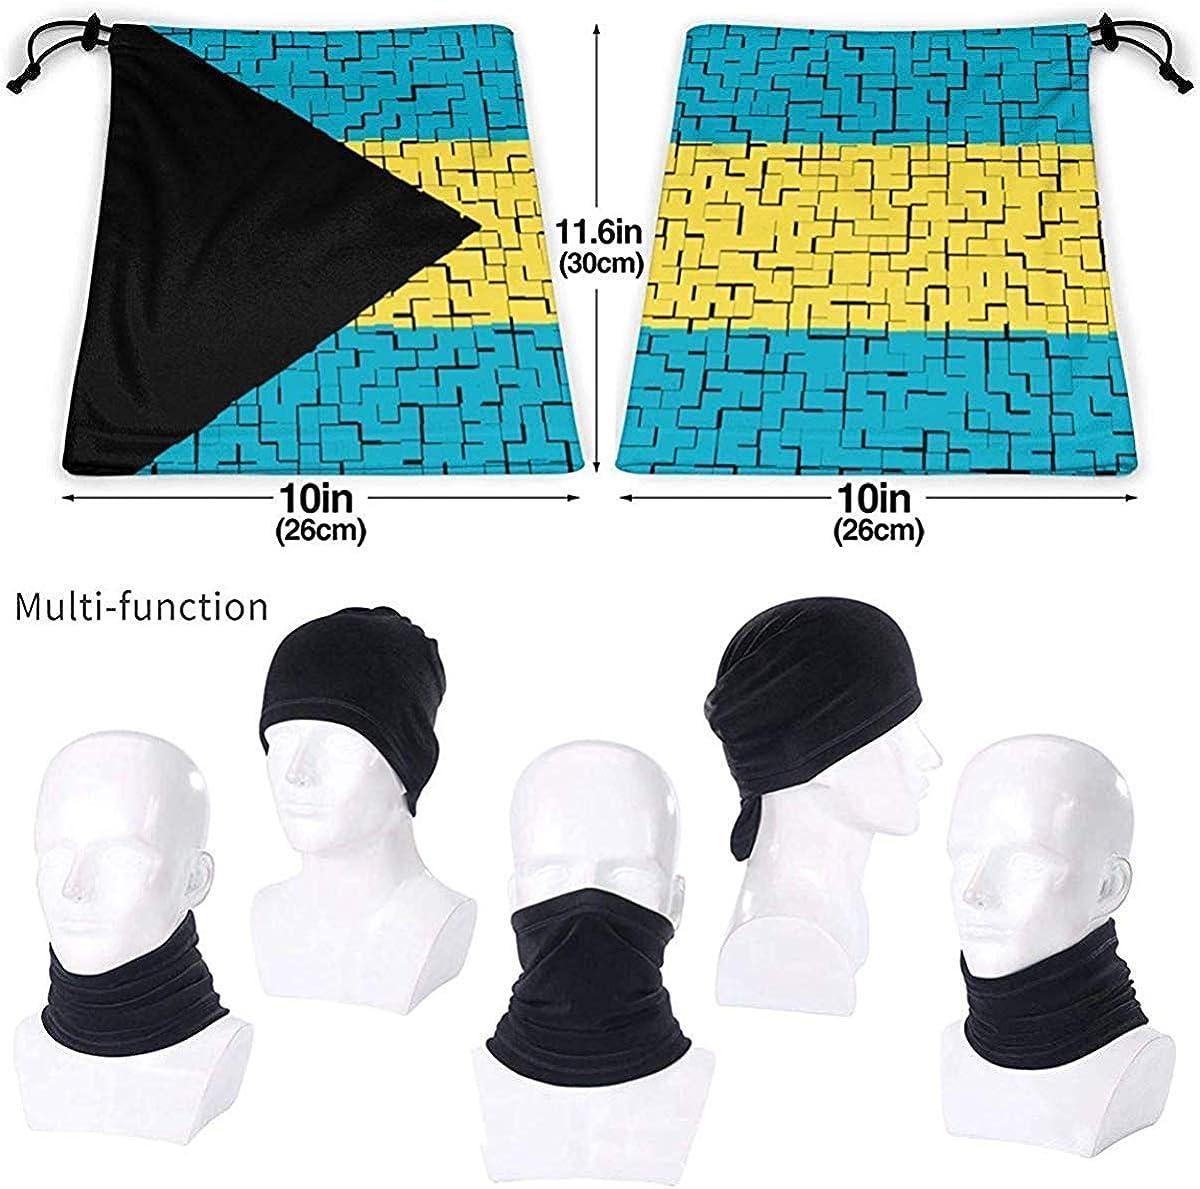 The Bahamas Flag Puzzle Microfiber Neck Warmer Balaclavas Soft Fleece Headwear Face Scarf Mask for Winter